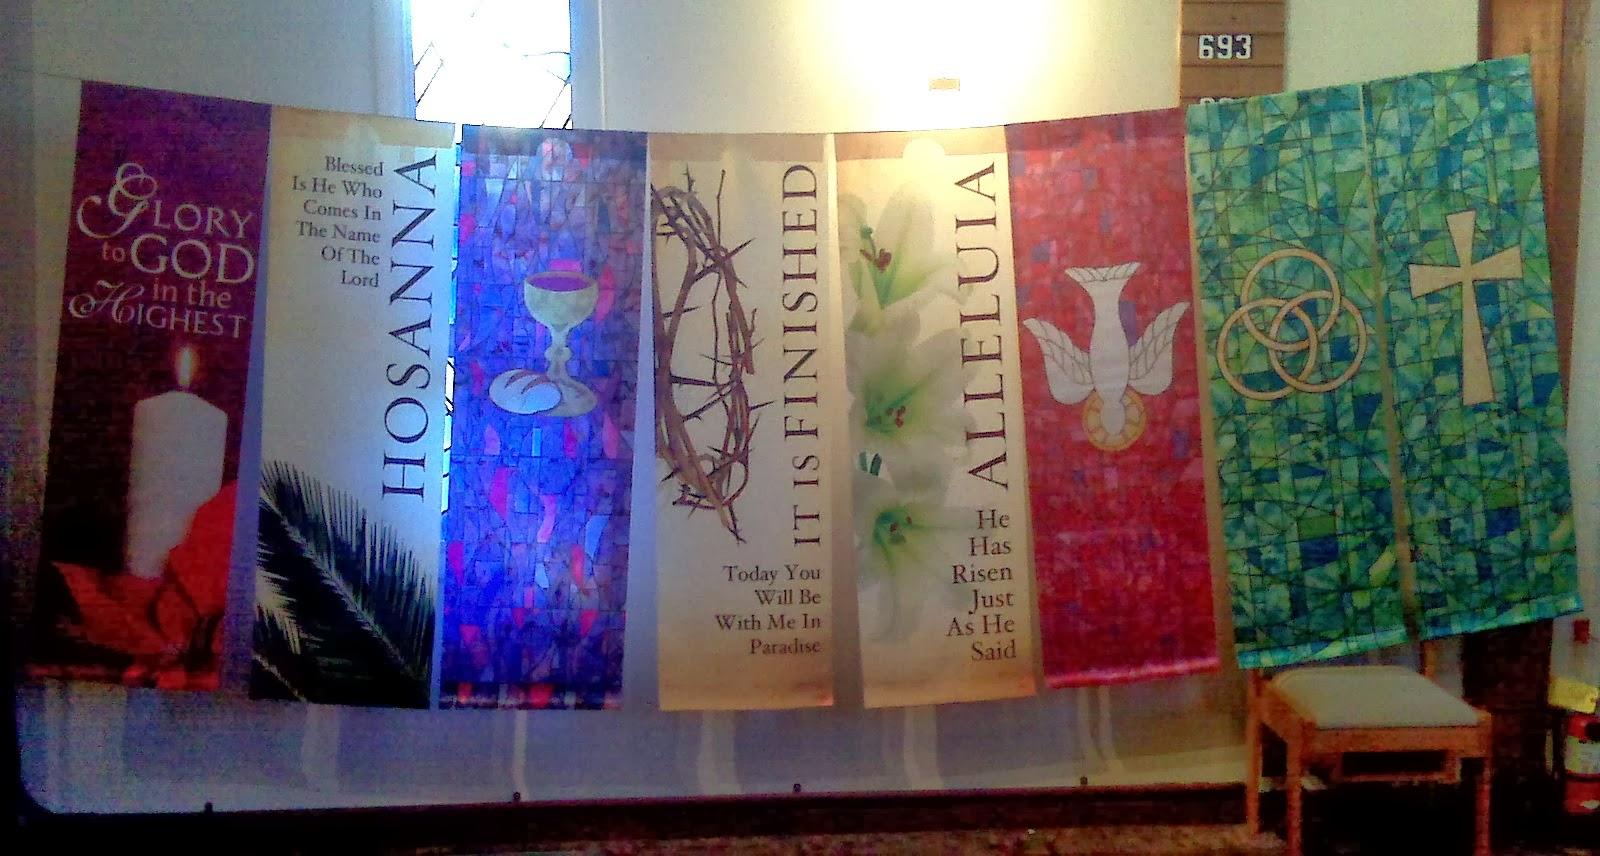 Church Banner Visual Display For Liturgical Calendar Year